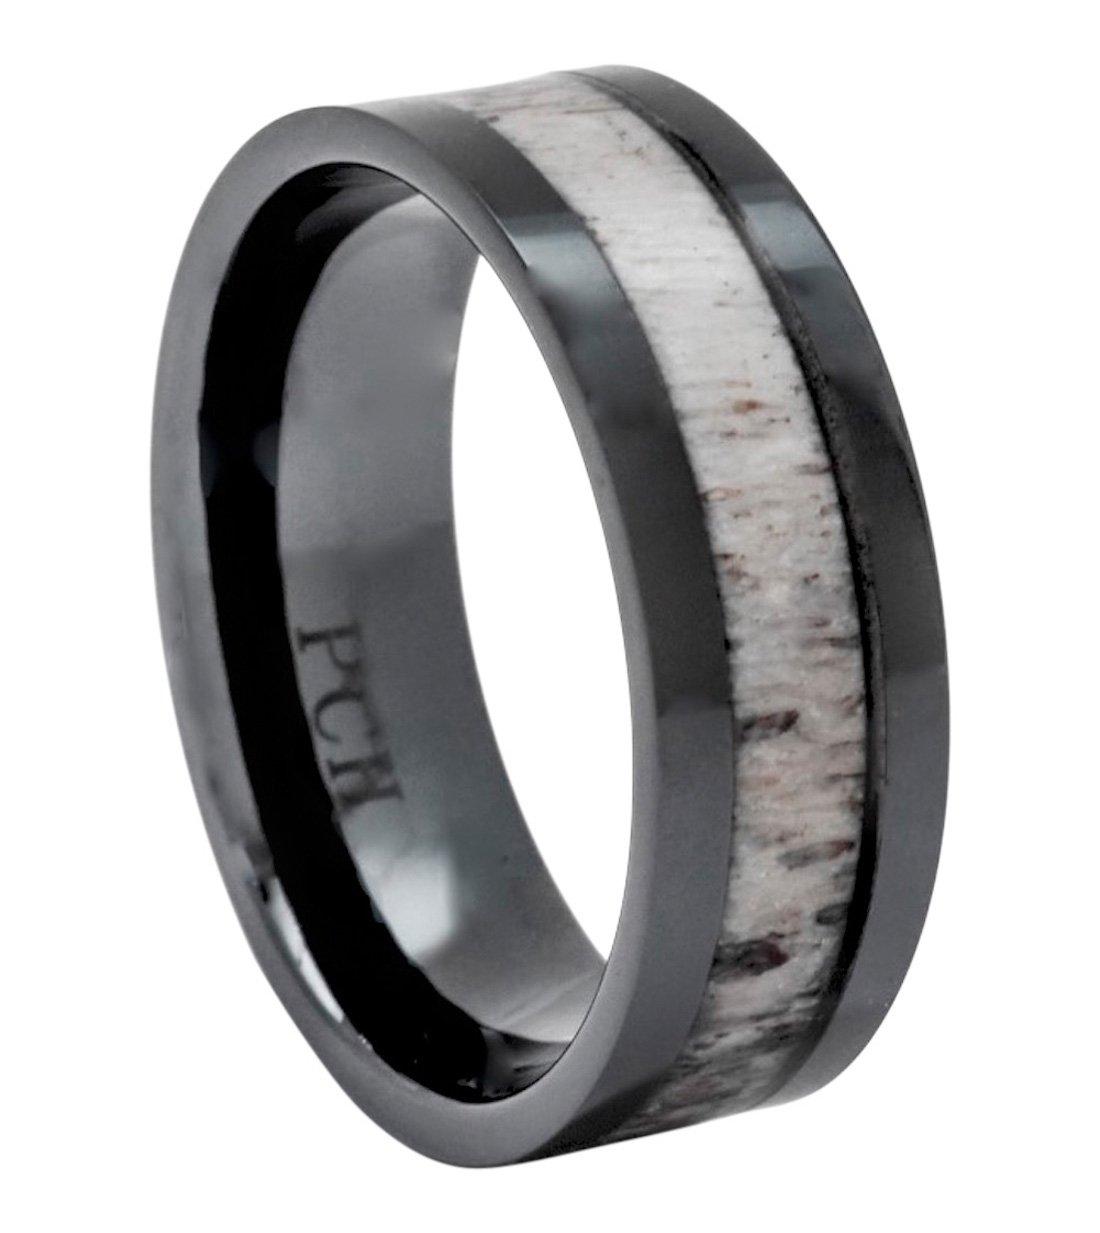 PCH Jewelers Deer Antler Ring in Black Ceramic 8mm Comfort Fit Wedding Band (10.5)